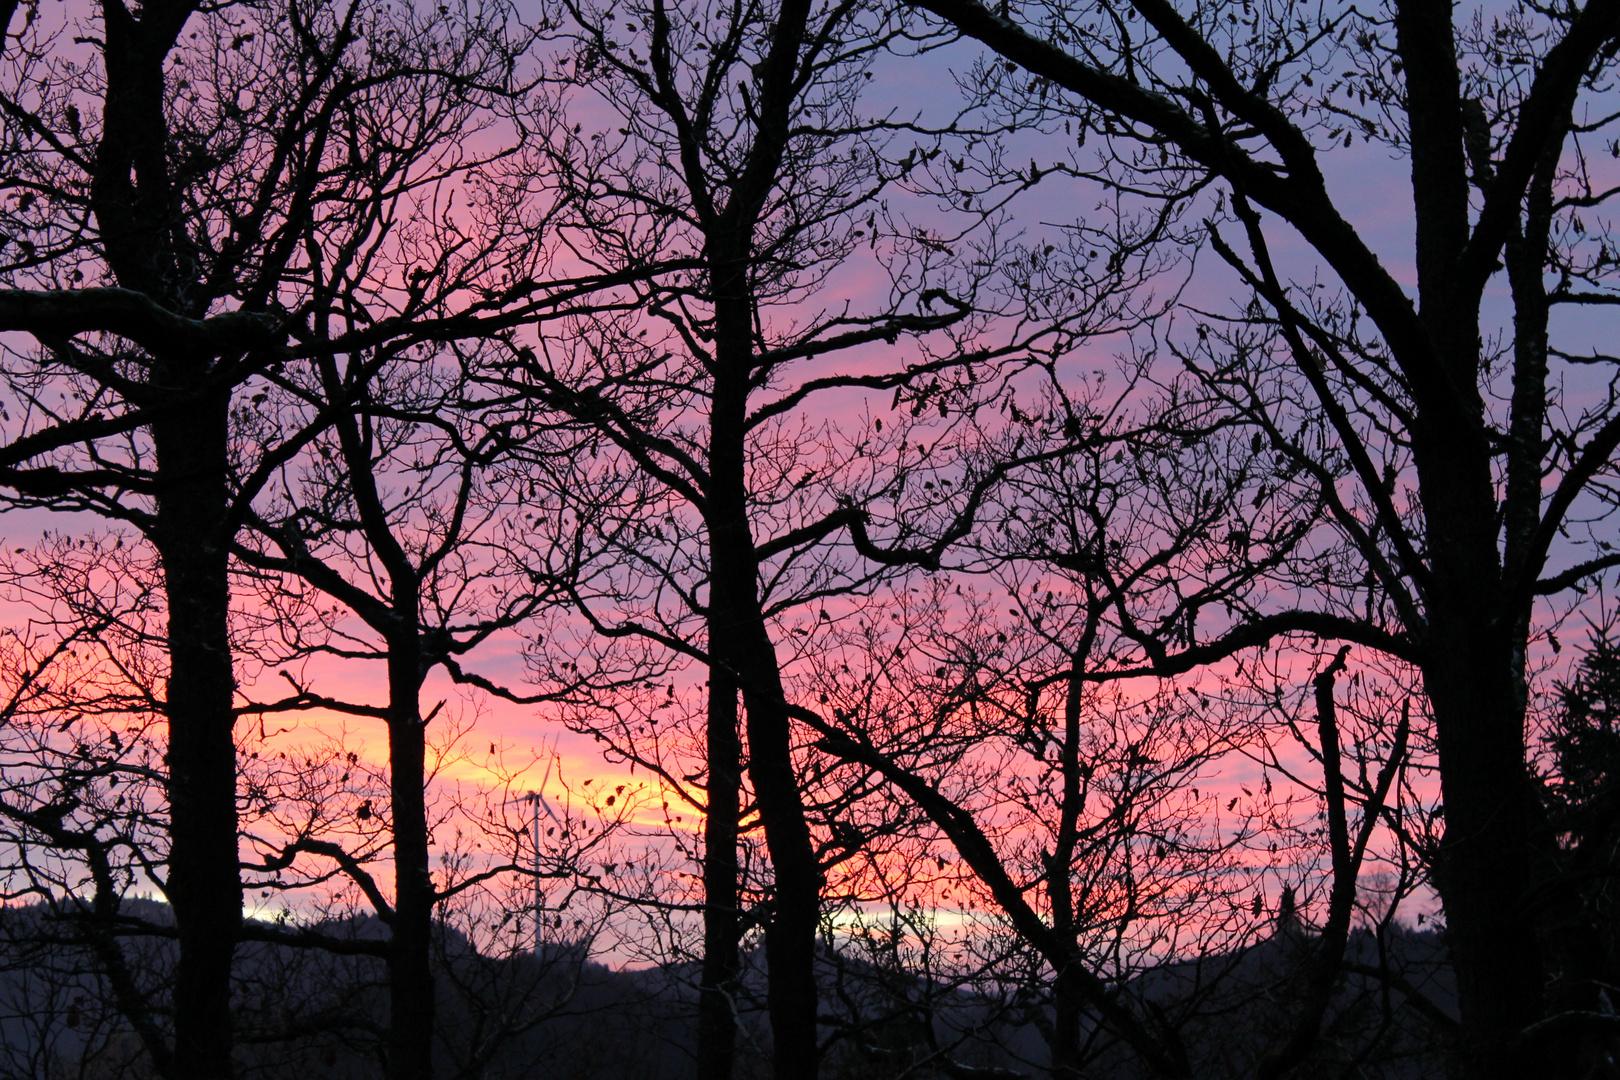 Sonnenuntergang Bad Laasphe 2014-11-27